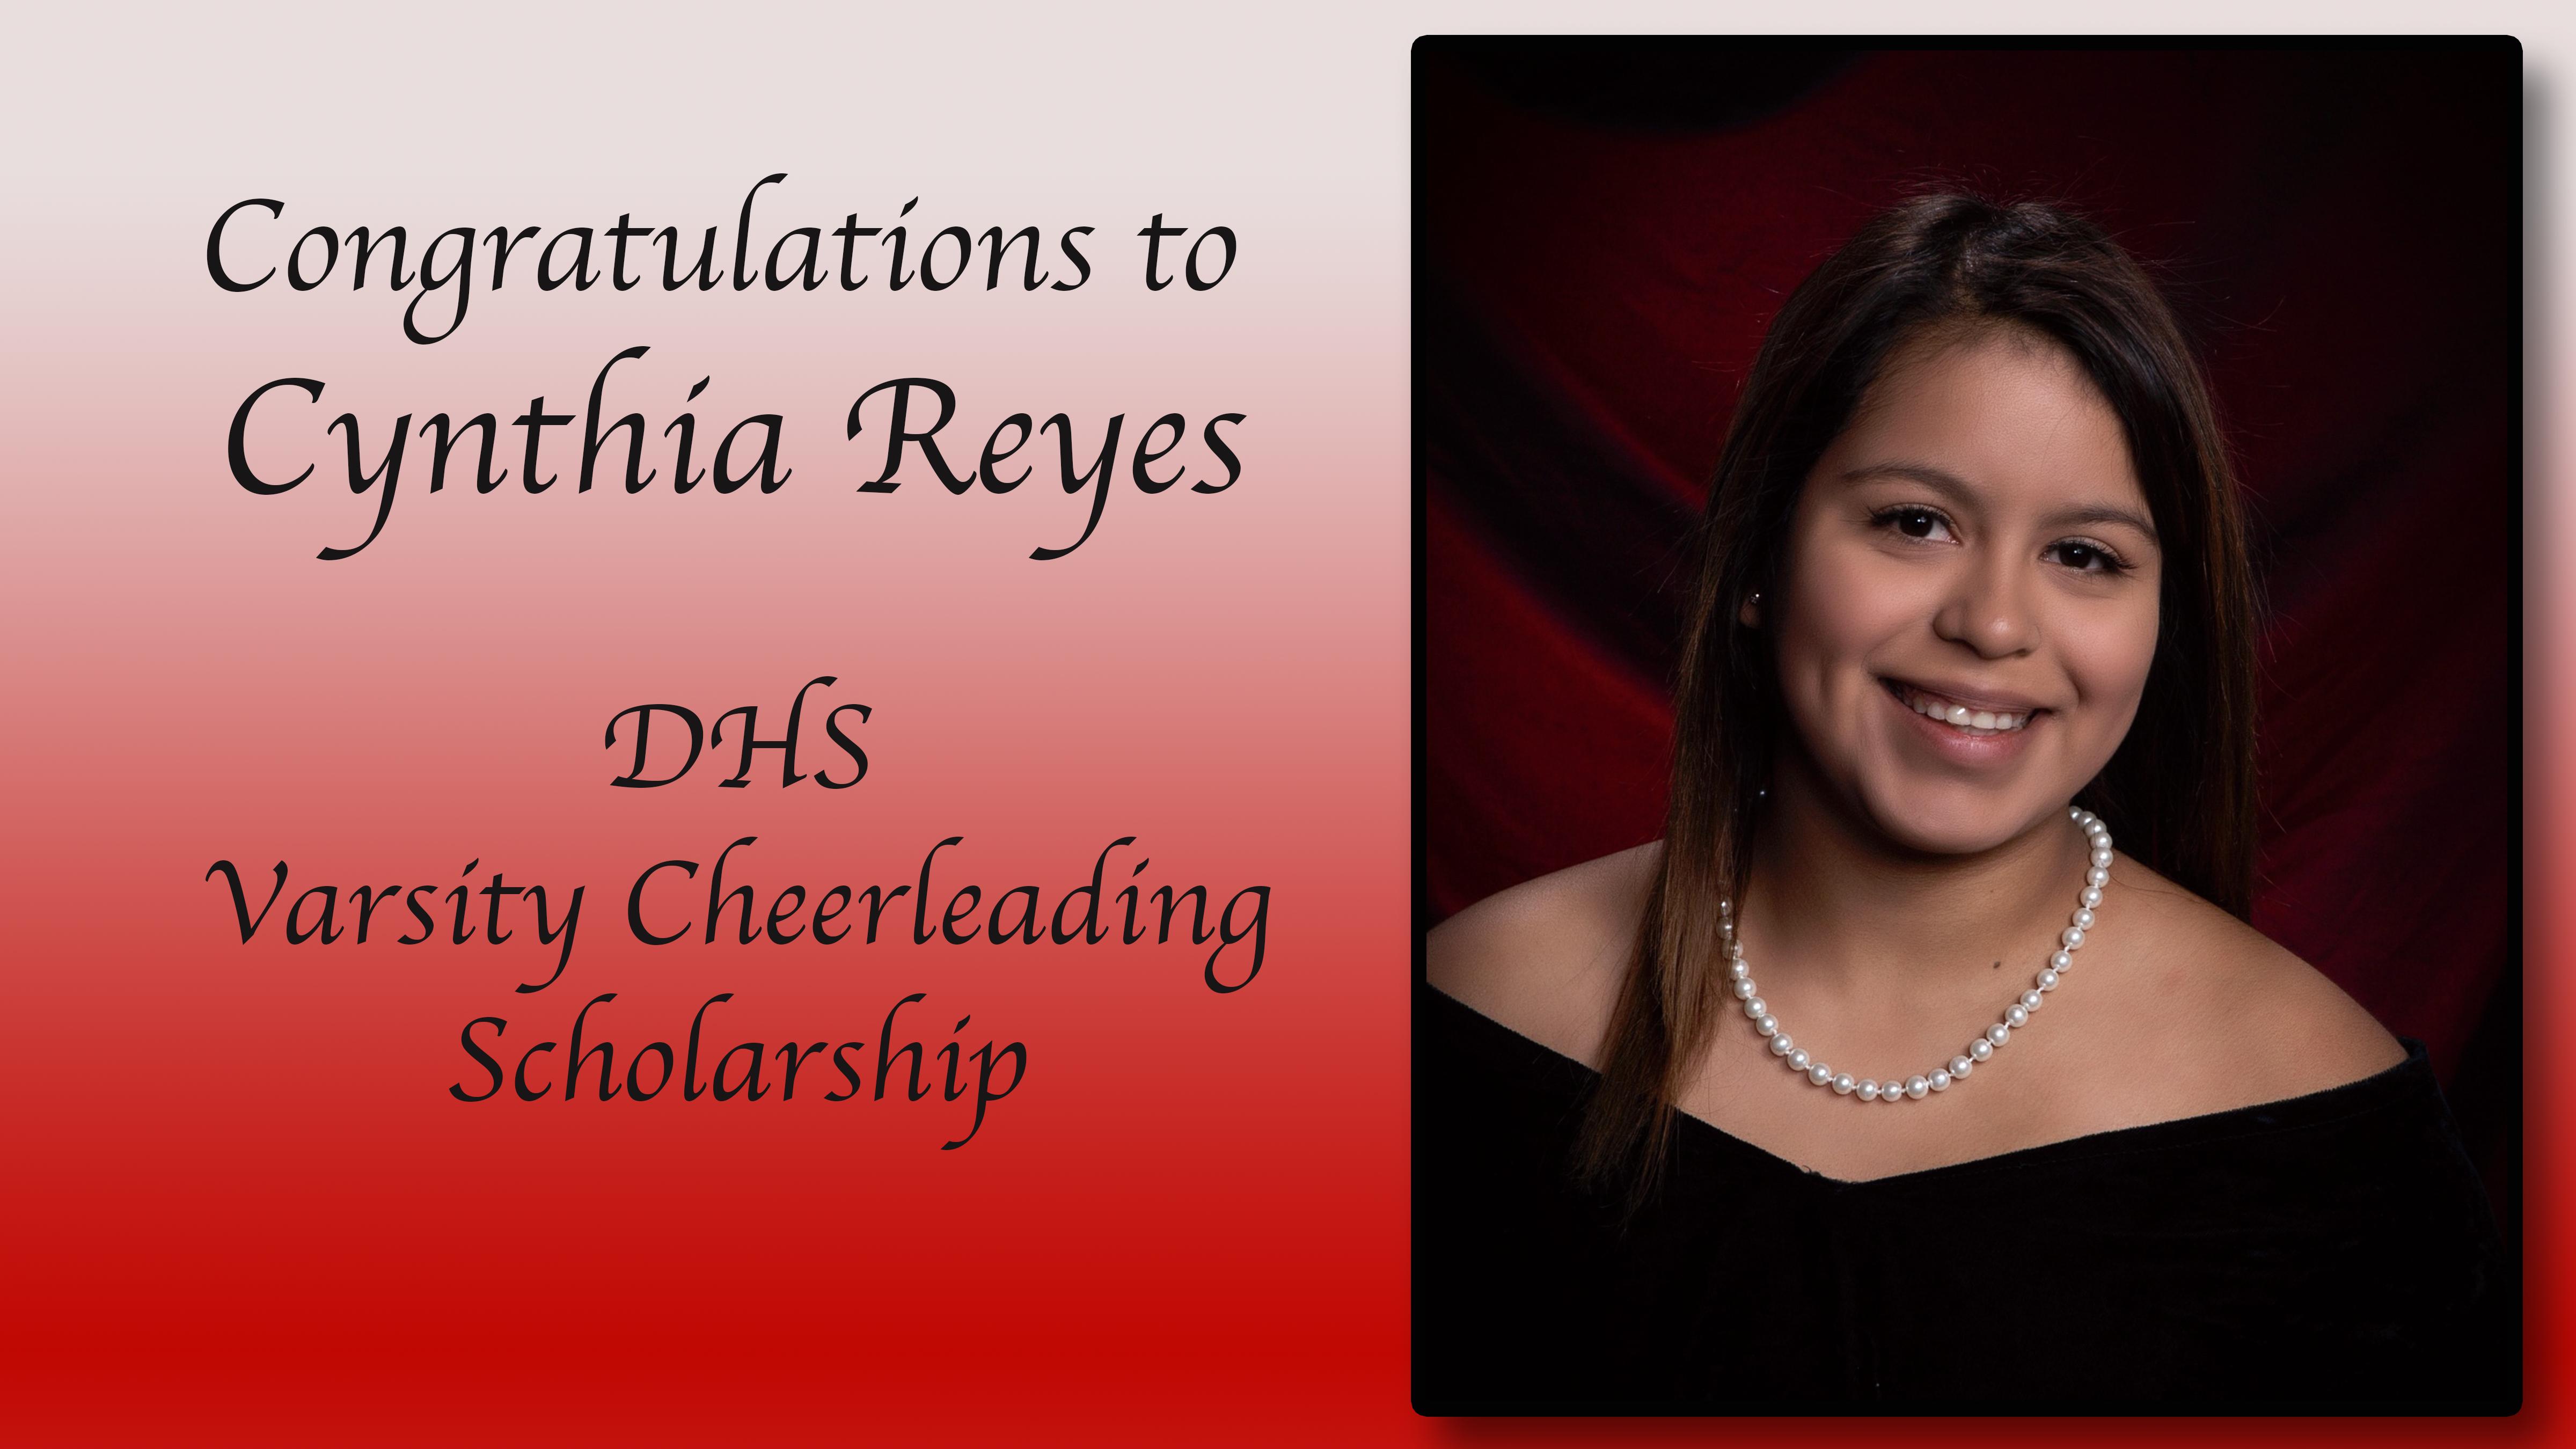 Cynthia Reyes Scholaship